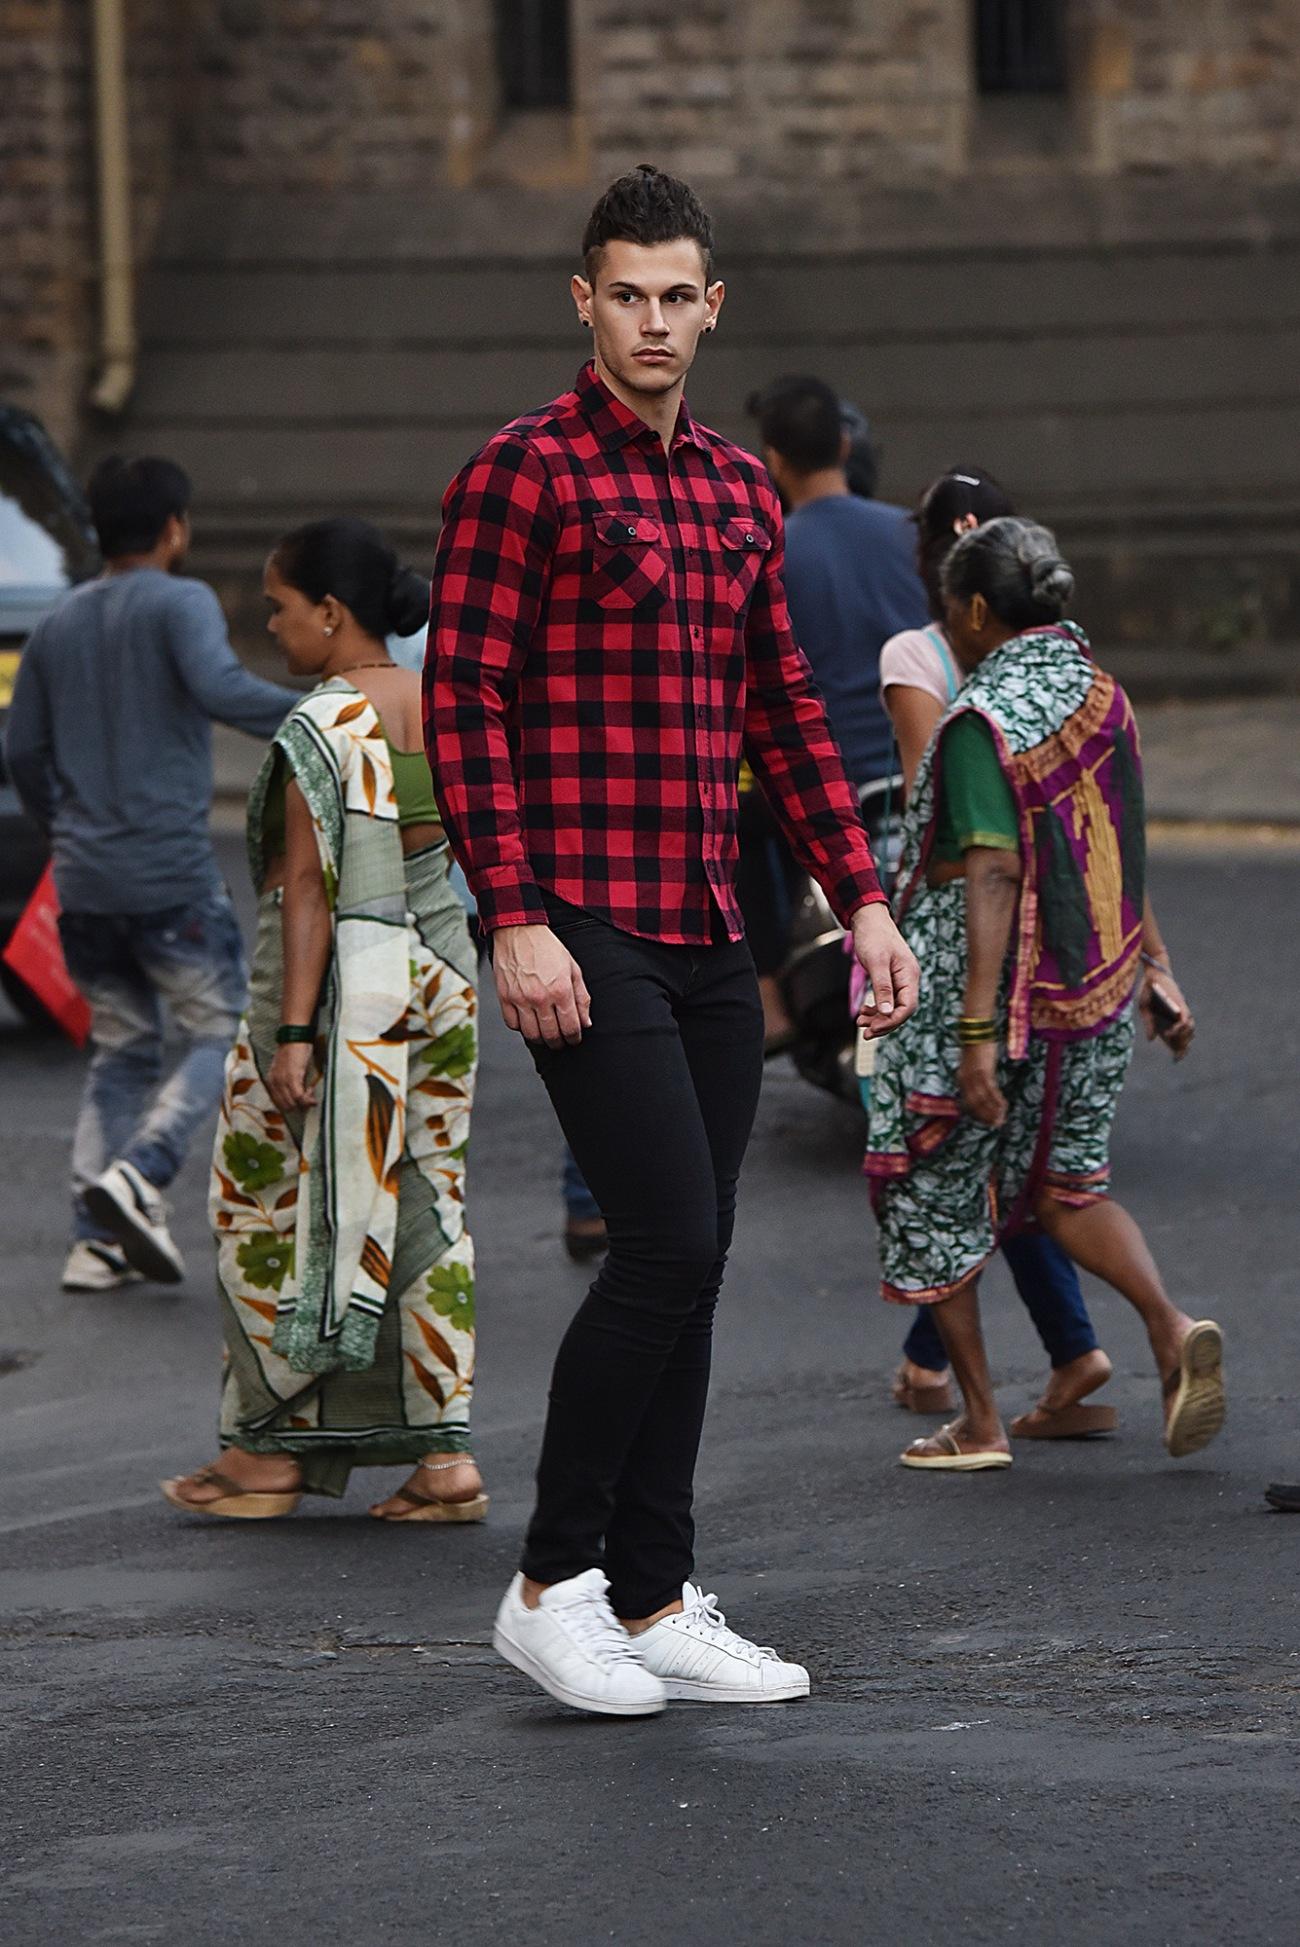 Boys Of Mumbai By Mladen Fashionably Male